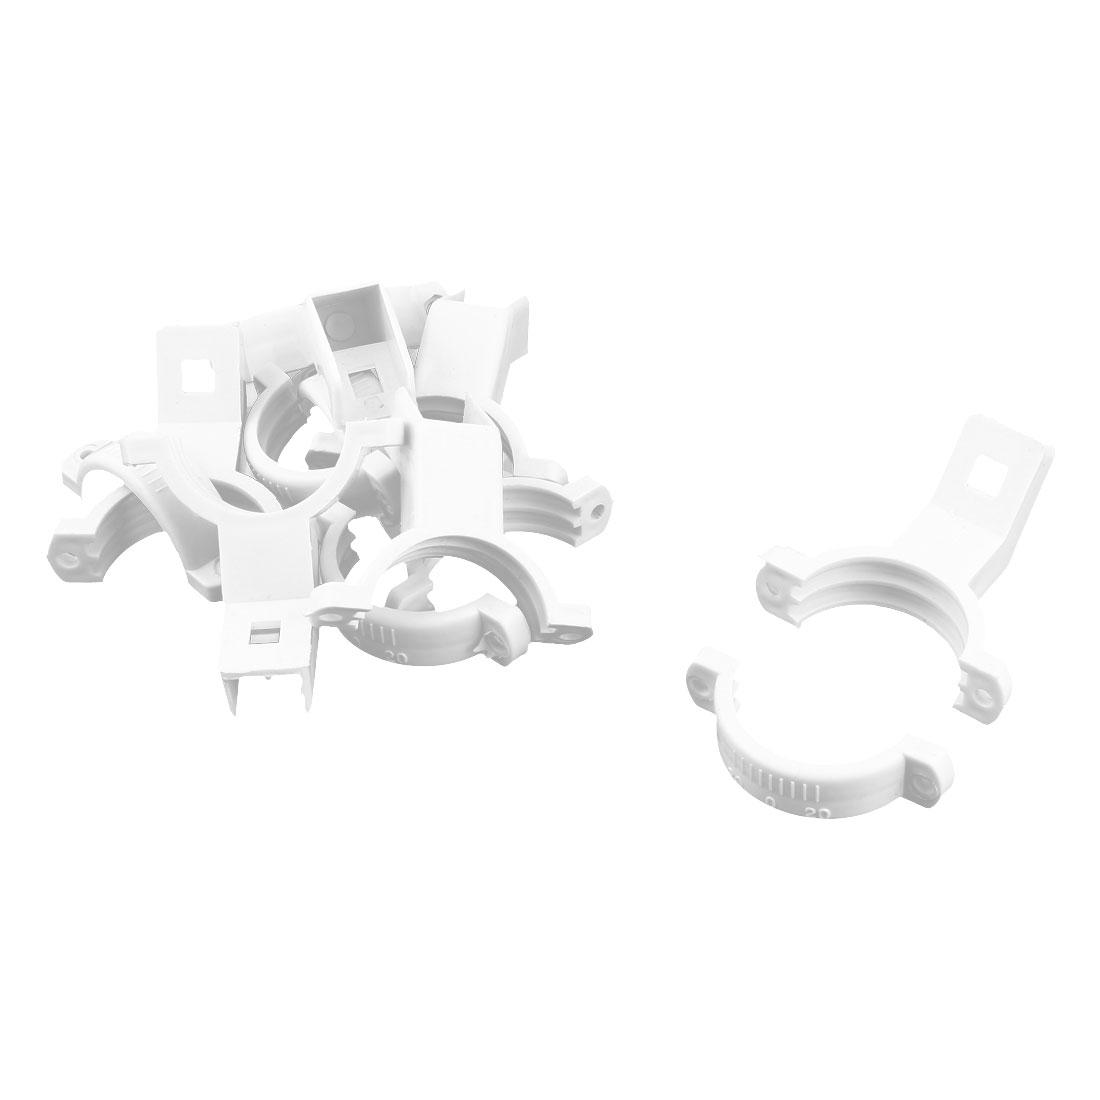 Plastic Single Dish LNB Bracket Holder Mount 40mm Dia White 6 Pcs for Ku Band